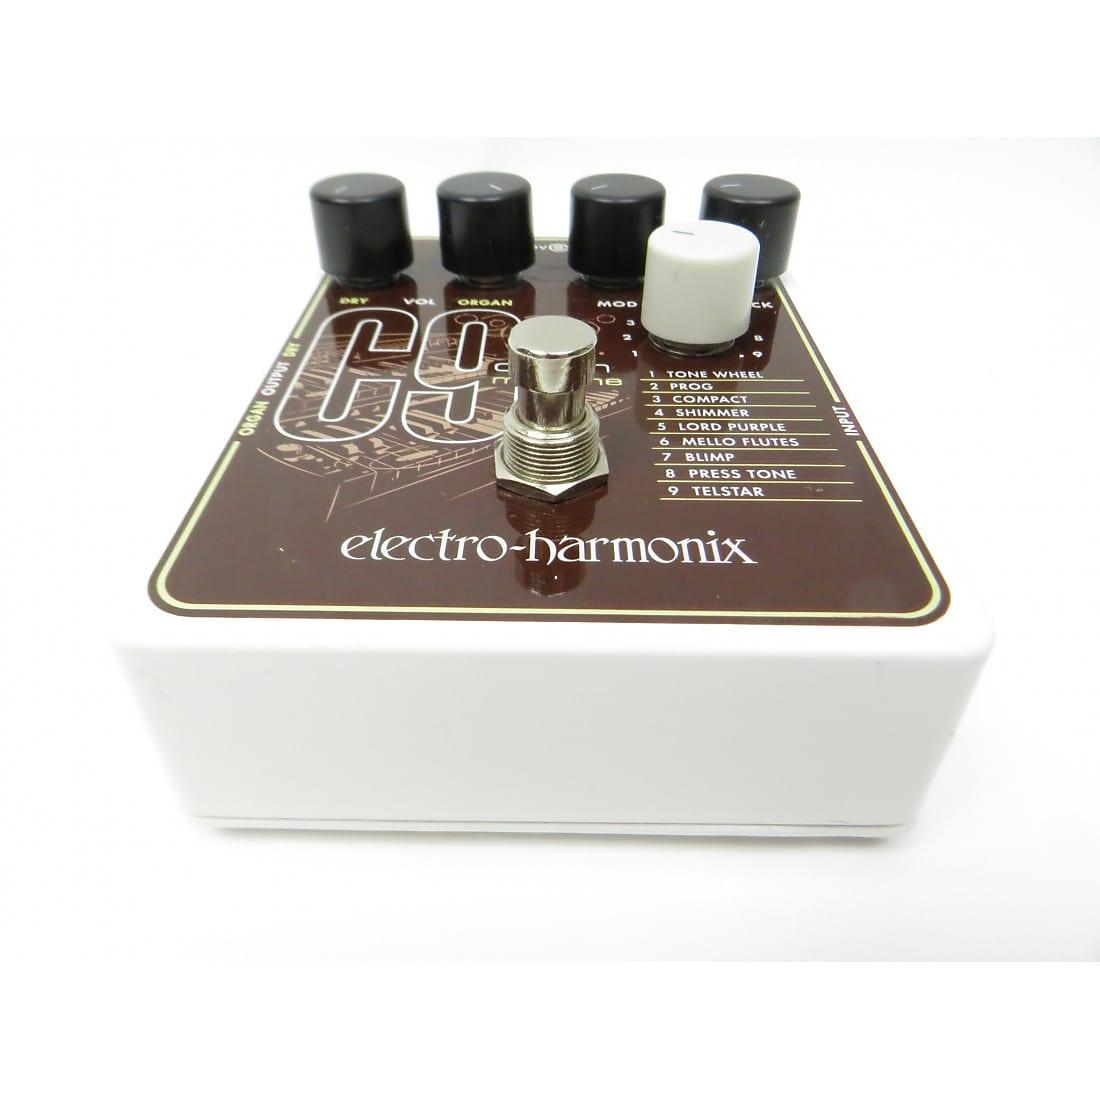 Electro-Harmonix EHX C9 Organ Machine Effects Pedal